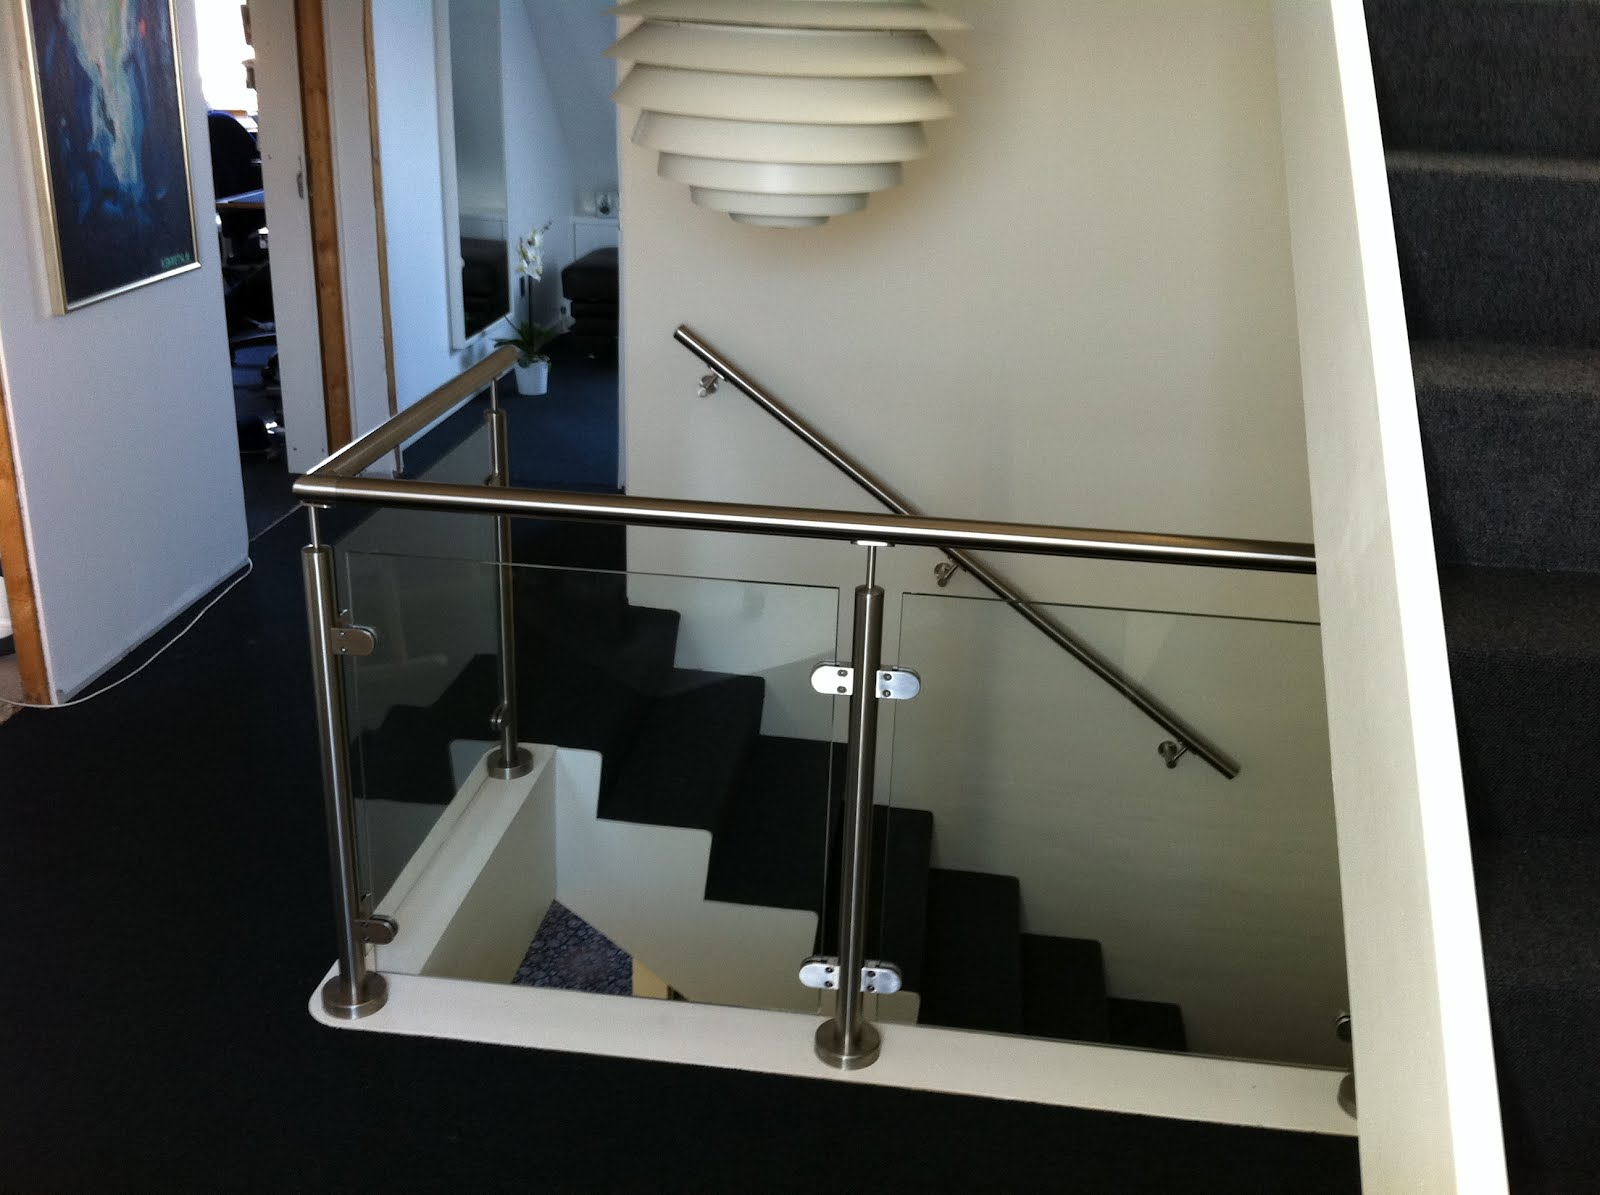 gel nder rustfrie gel nder galv gel nder trappe gel nder glas gel nder gel nder p trappe. Black Bedroom Furniture Sets. Home Design Ideas